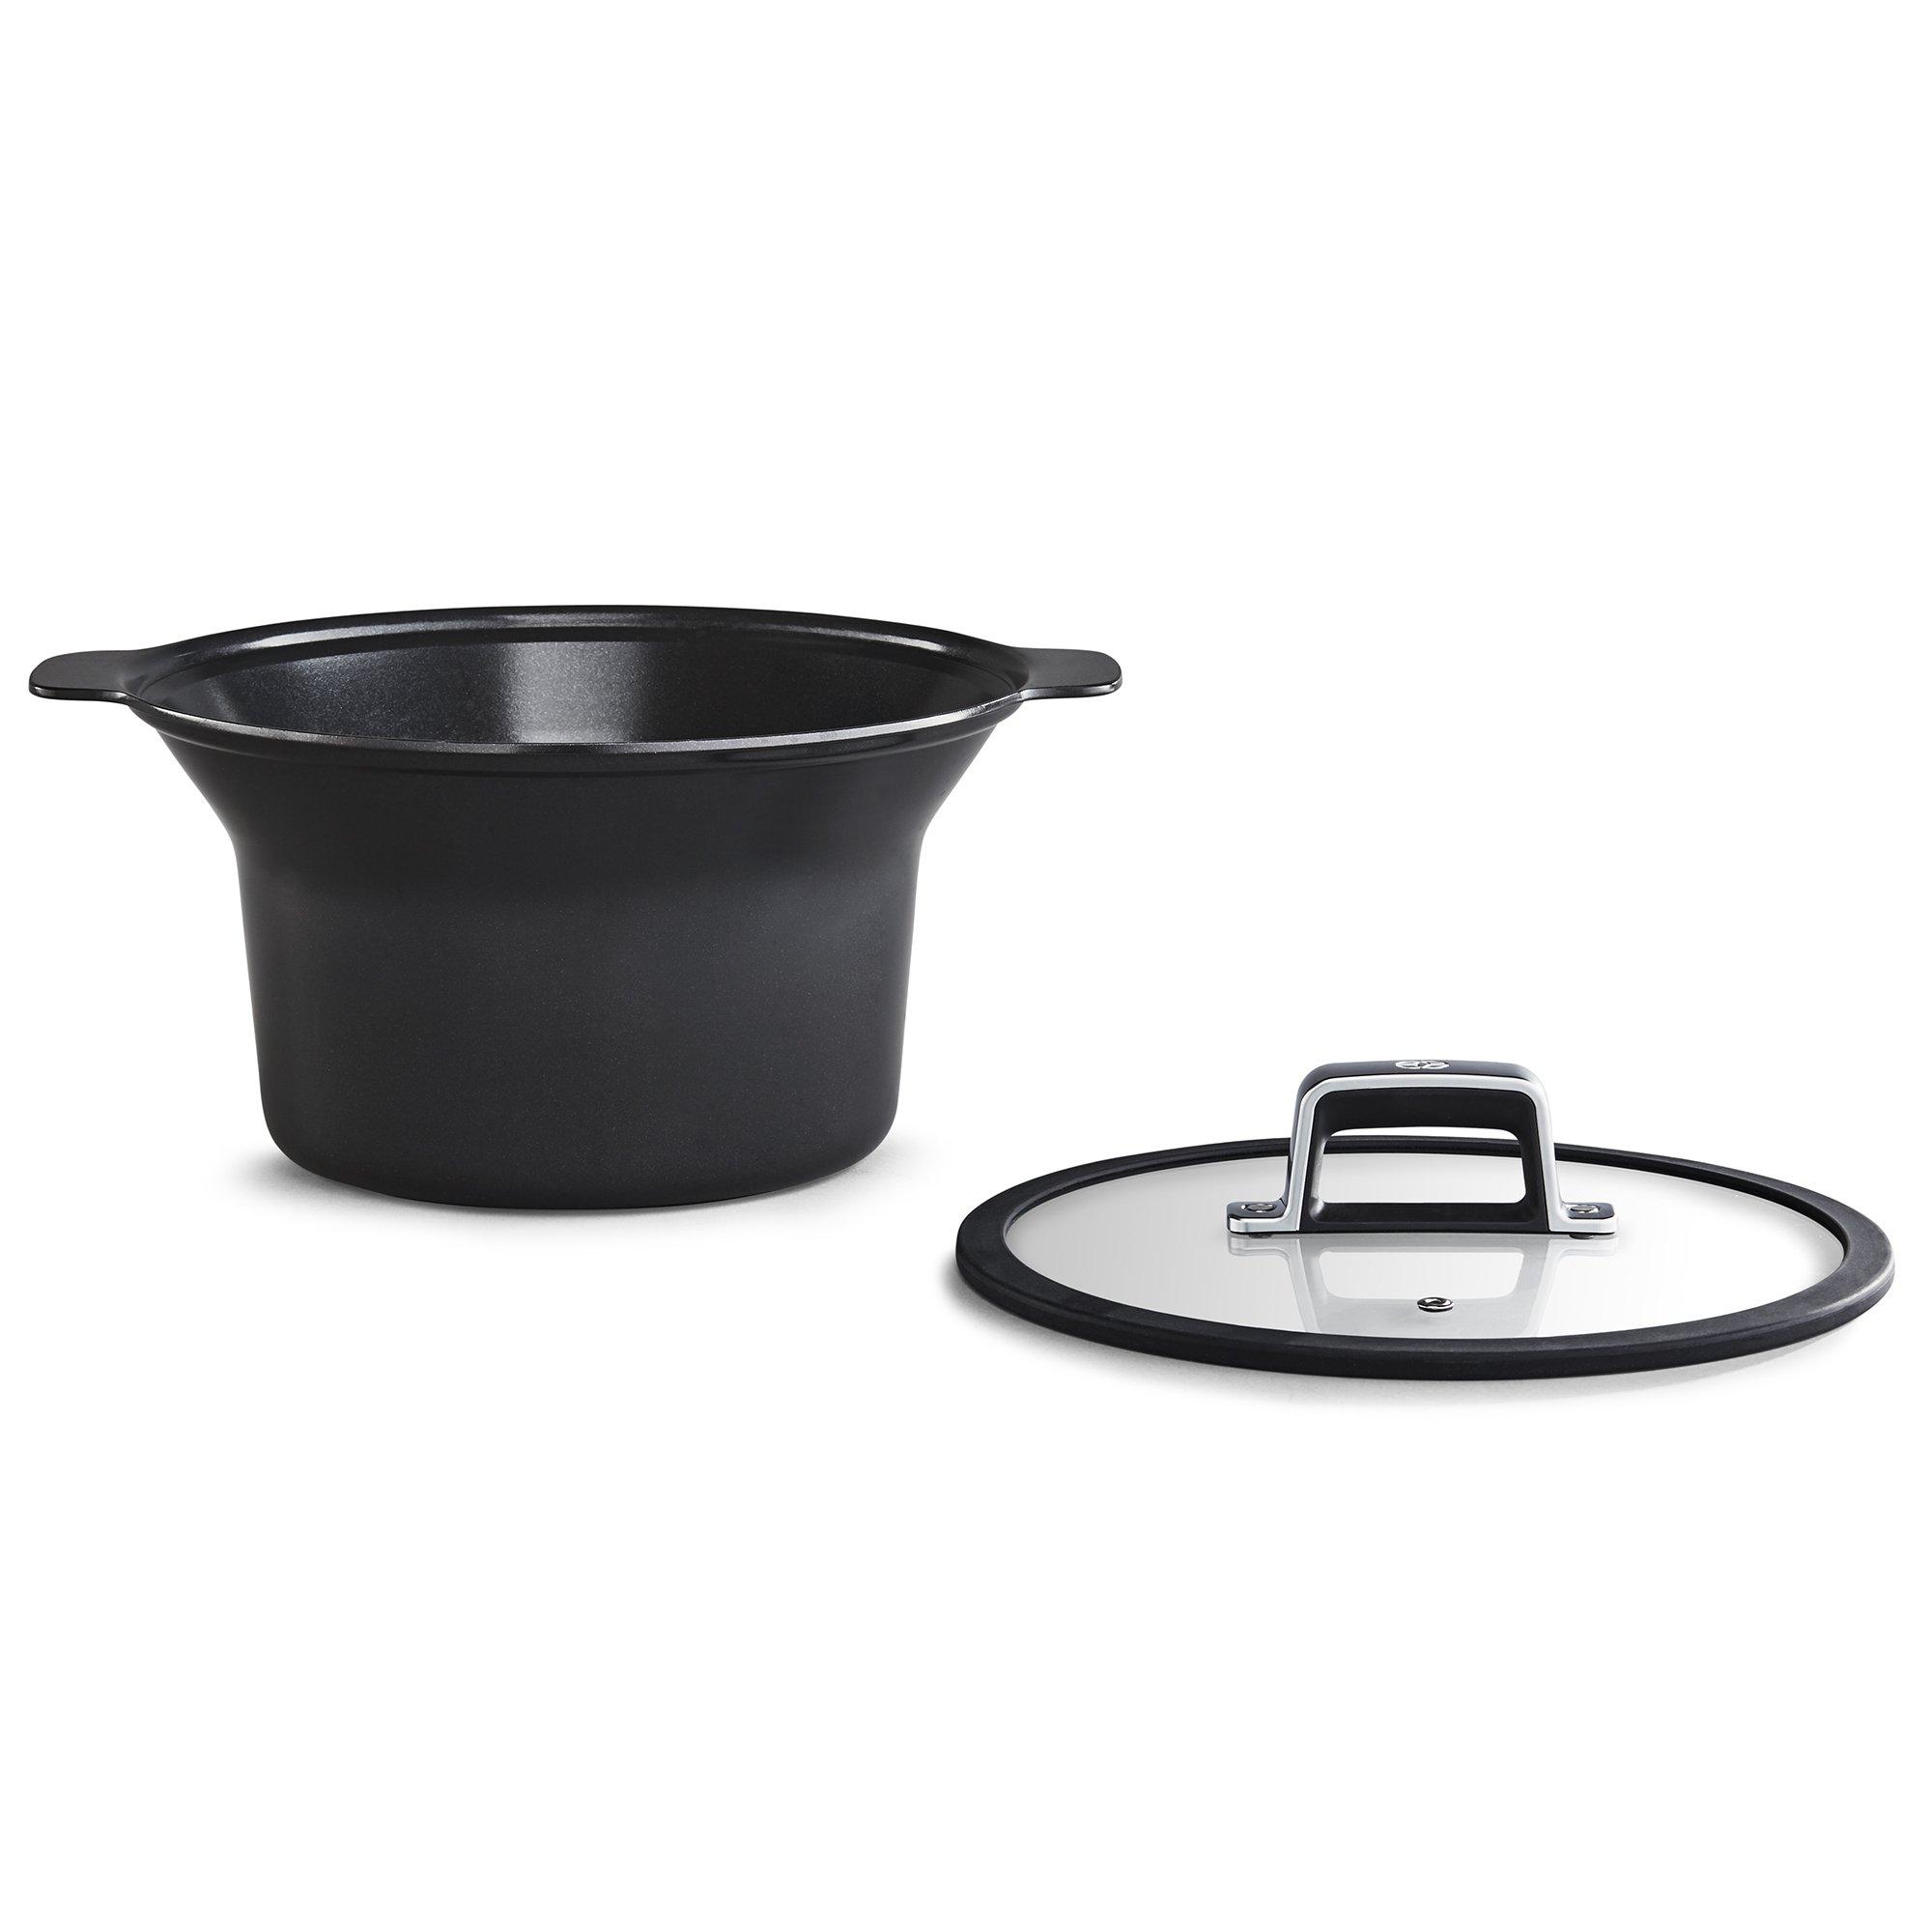 Calphalon Digital Sauté Slow Cooker Replacement Cooking Pot